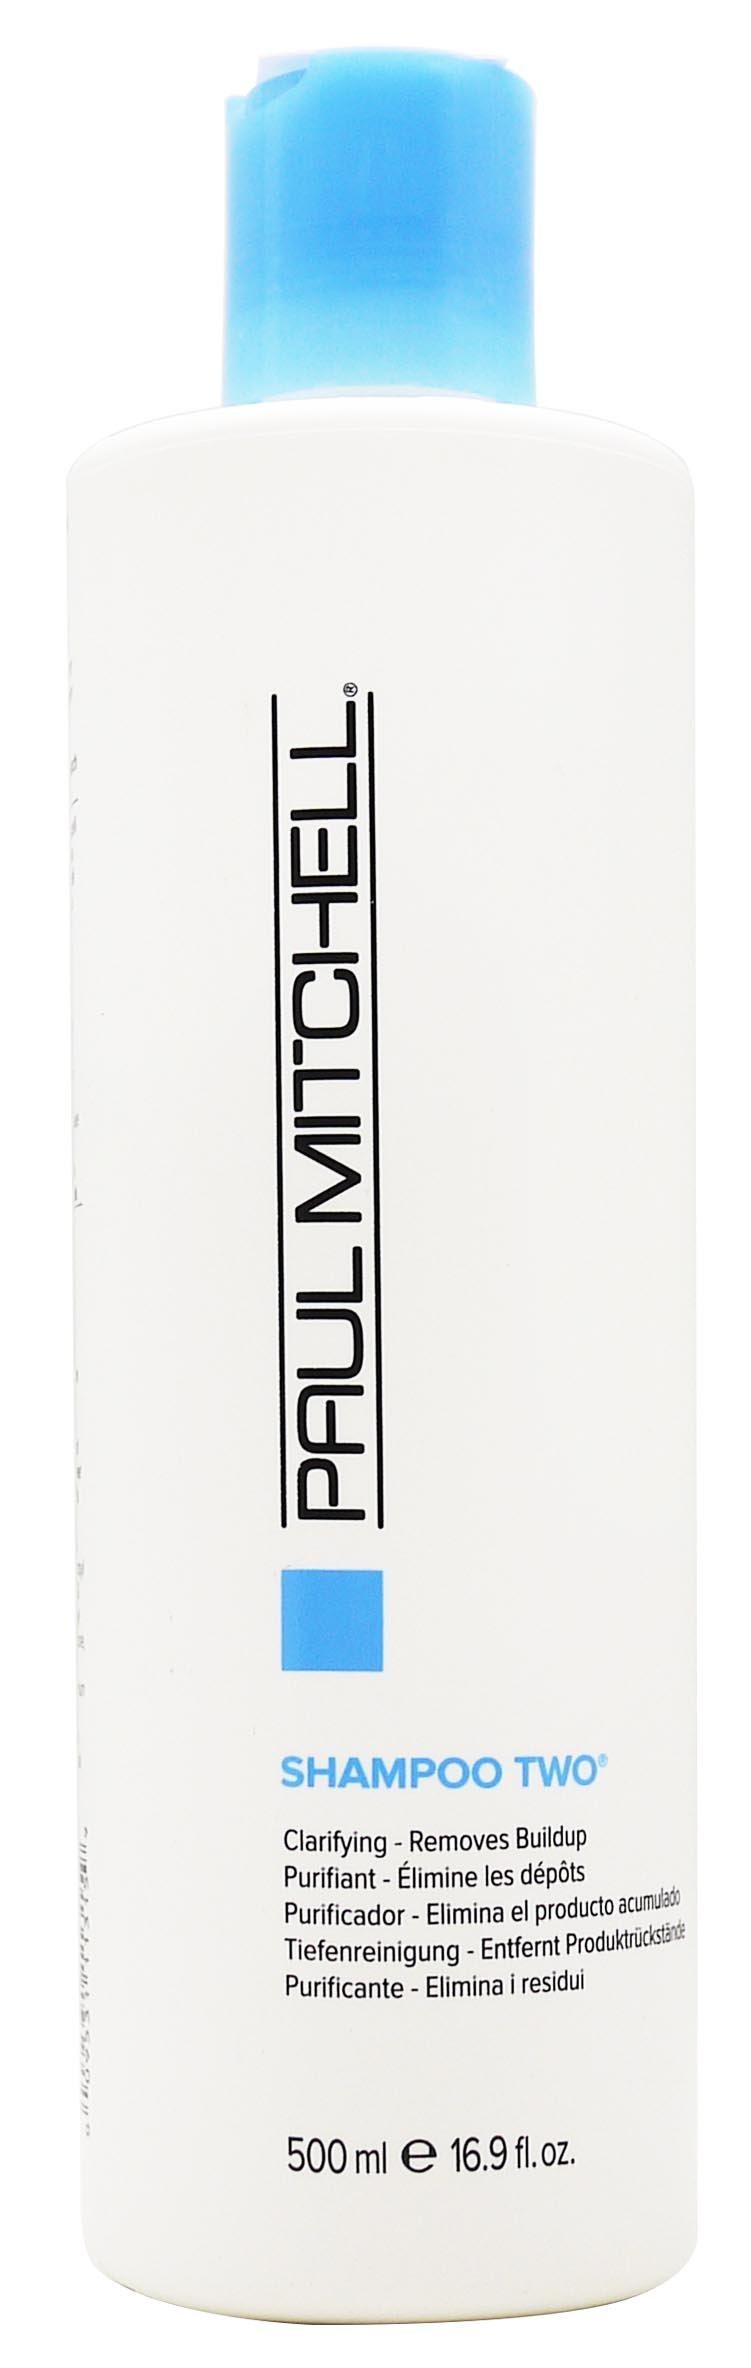 PAUL MITCHELL 1號洗髮精 2號洗髮精 3號洗髮精 1000ML / 2號洗髮精 500ML◐香水綁馬尾◐ 1